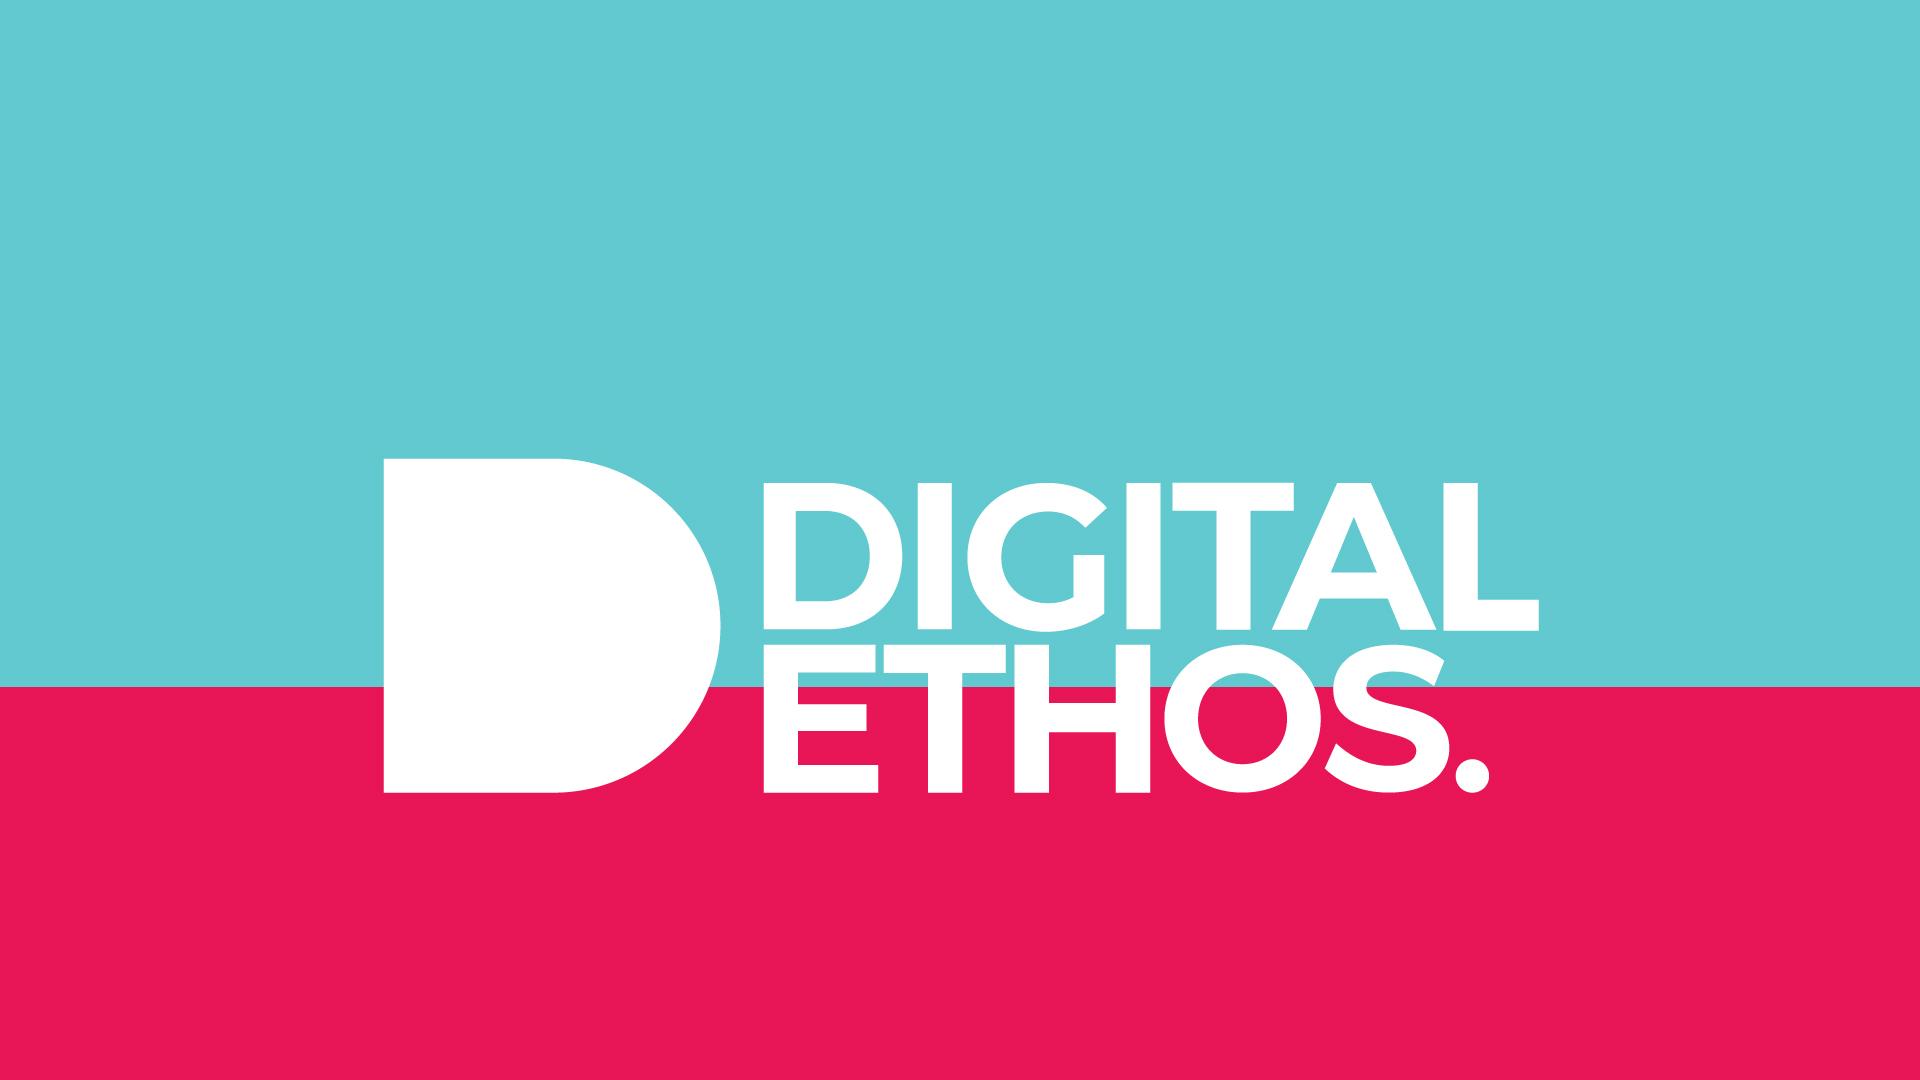 Digital Ethos Limited